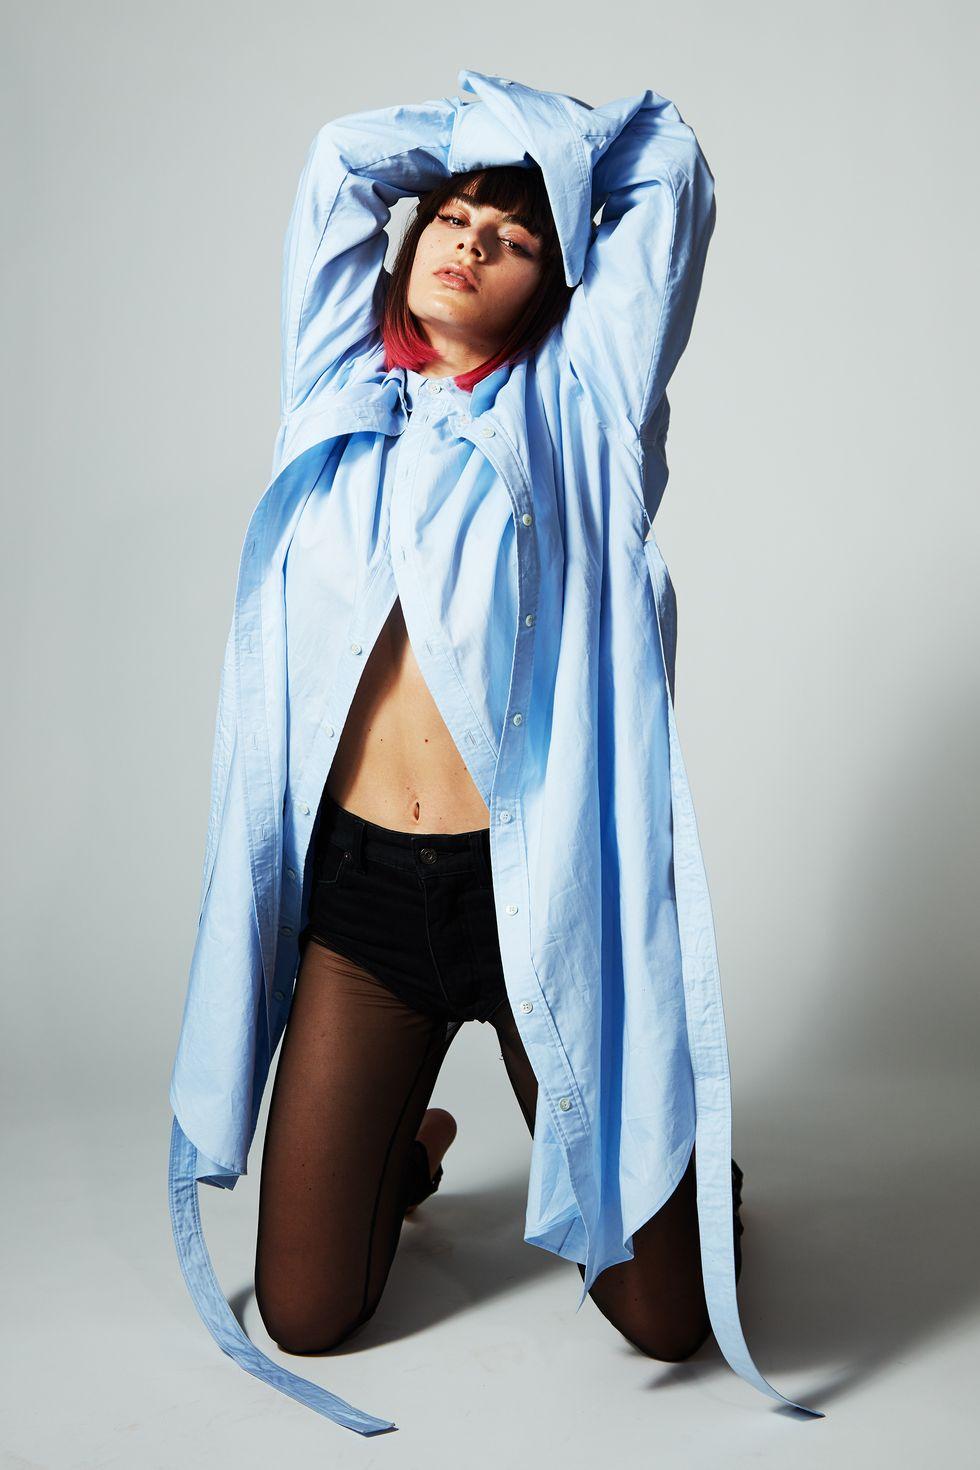 charli-xcx-tercer-album-entrevista